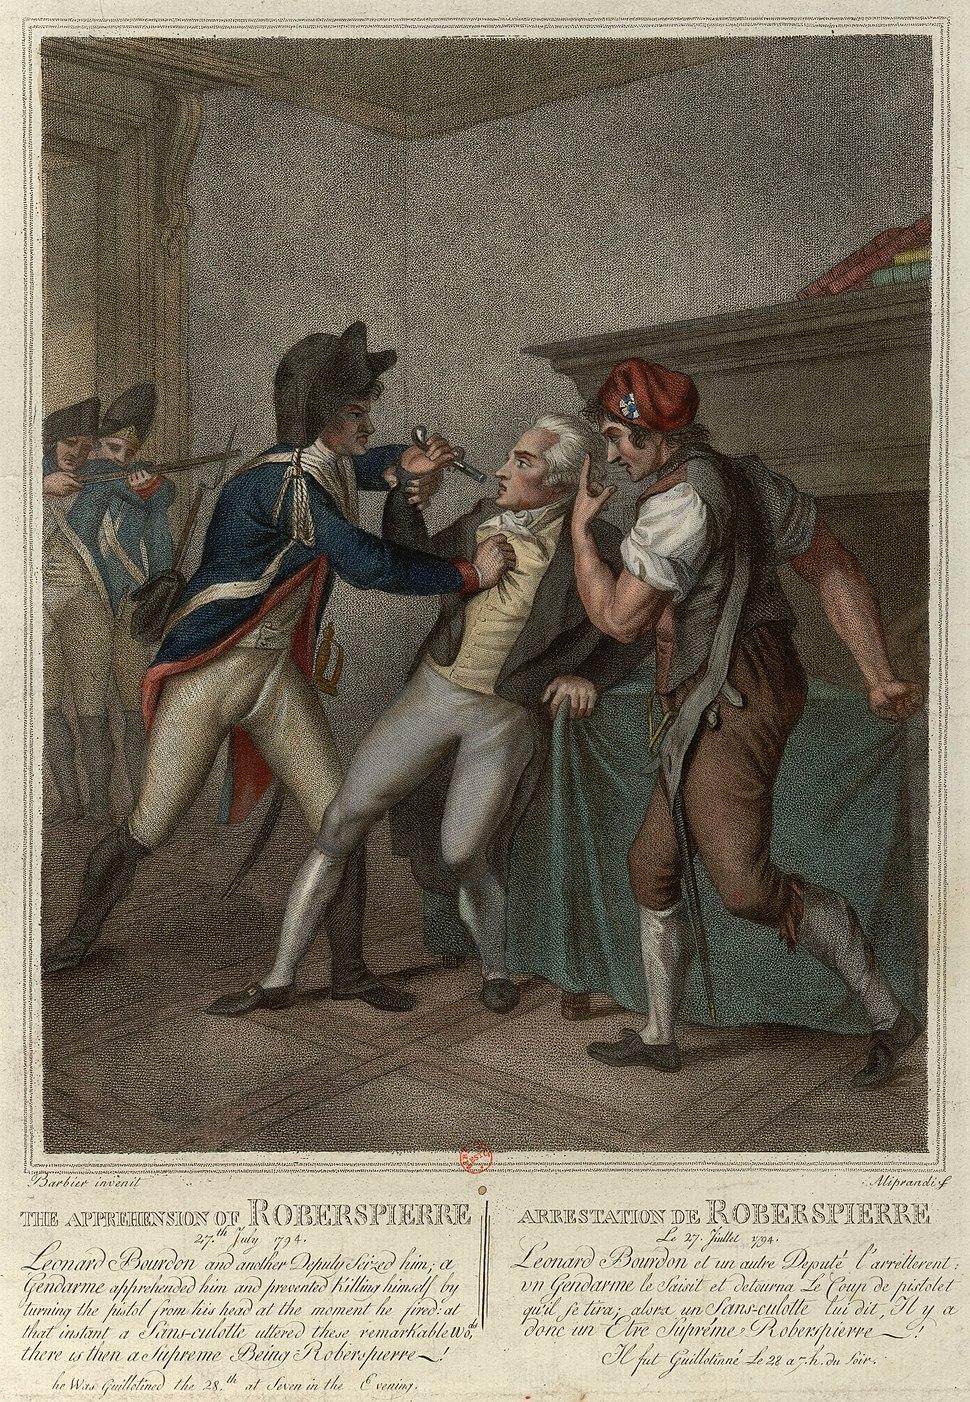 Arrestation de Robespierre